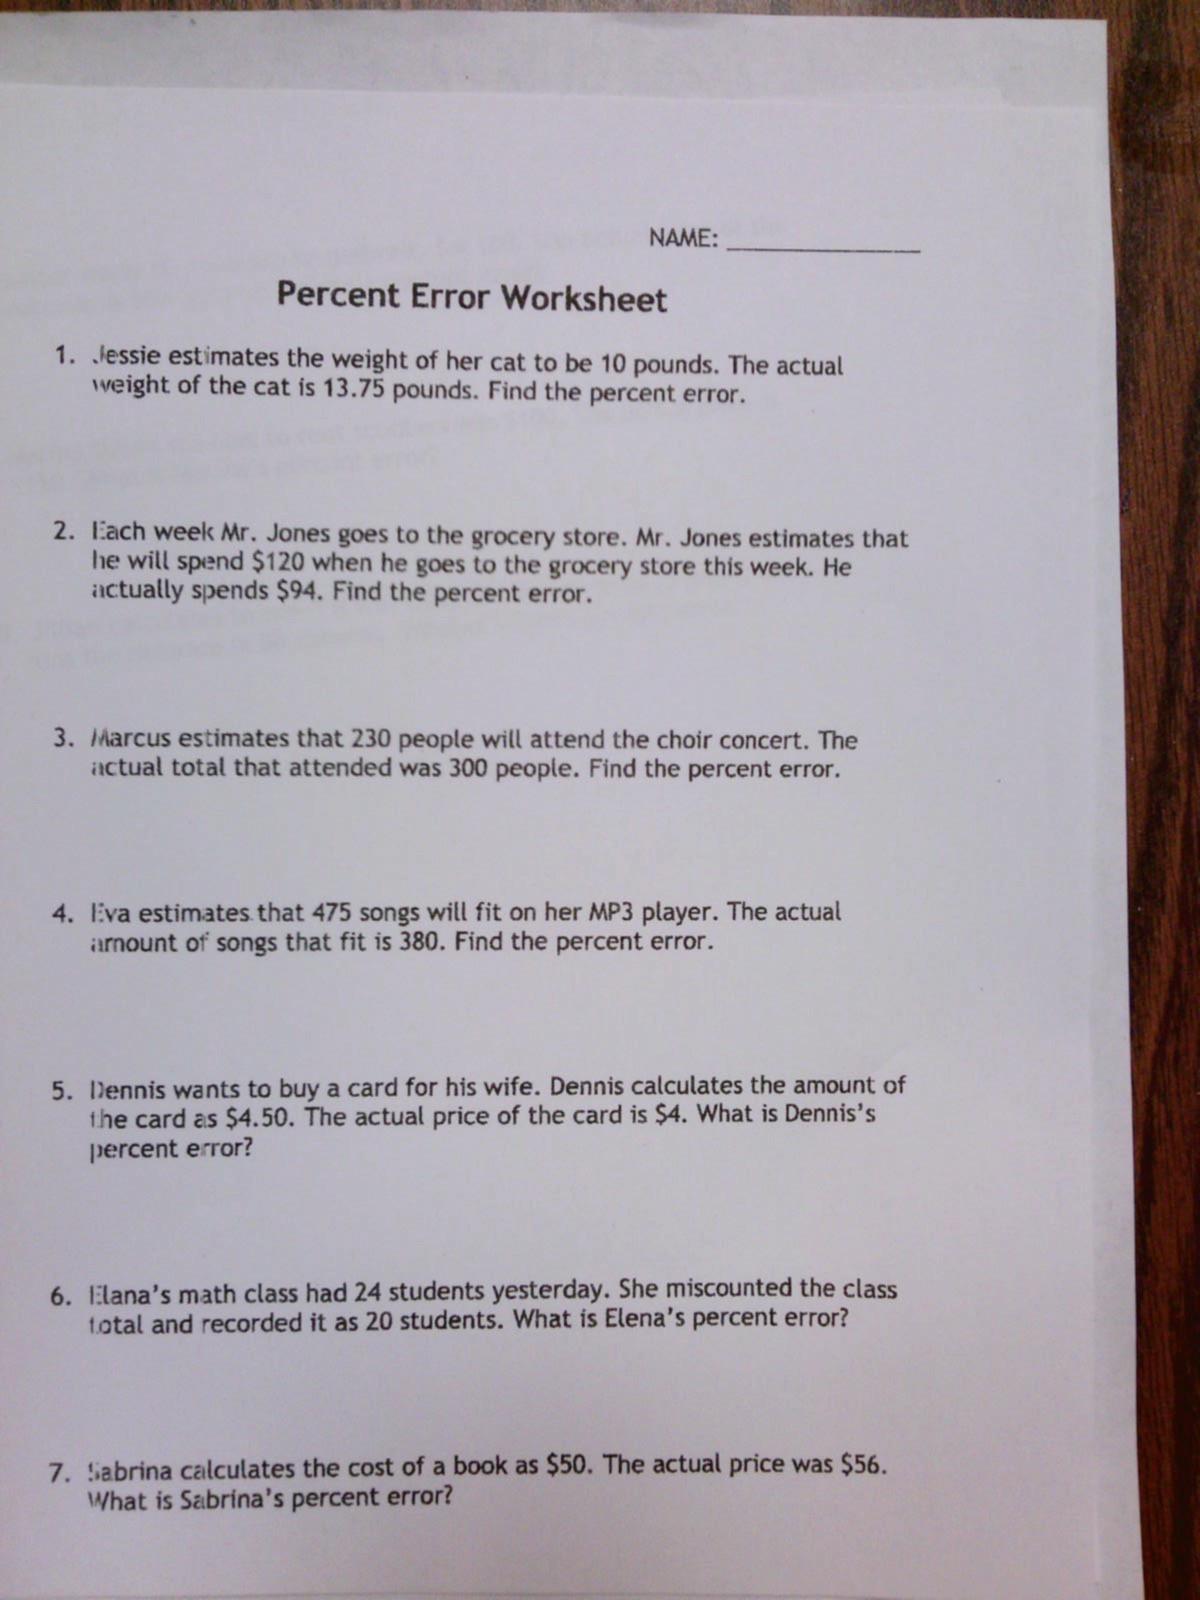 Percent Error Worksheet Answer Key Melanie Owens Drakes Creek Middle School